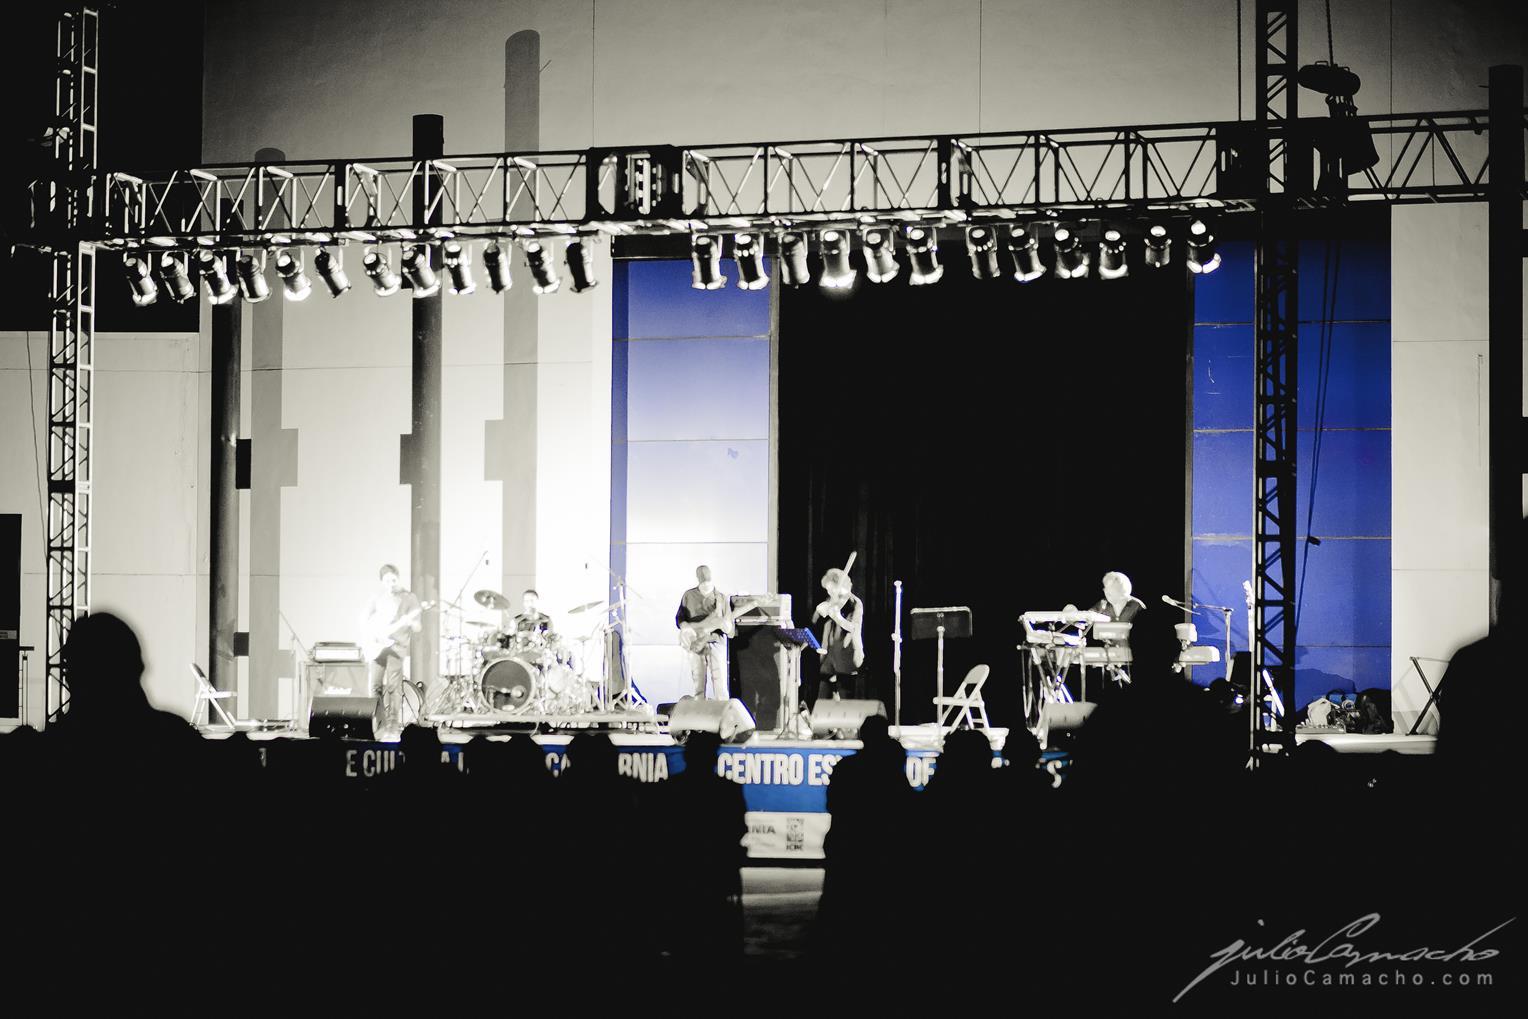 2014-10-30 31 CAST TOUR Ensenada y Tijuana - 0626 - www.Juli (Copy).jpg